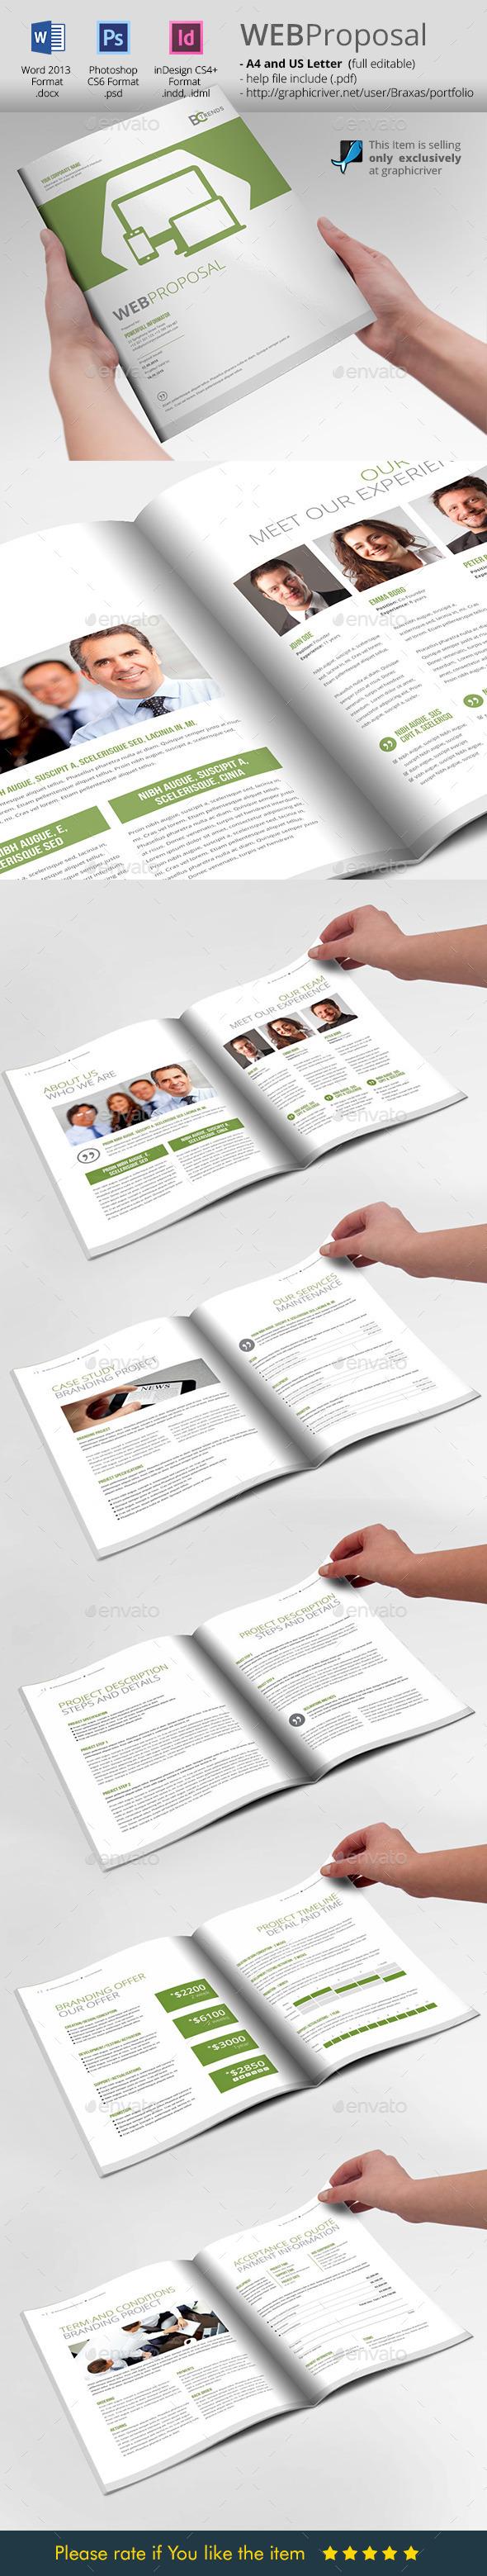 GraphicRiver WEB Proposal Brochure Template 10341288